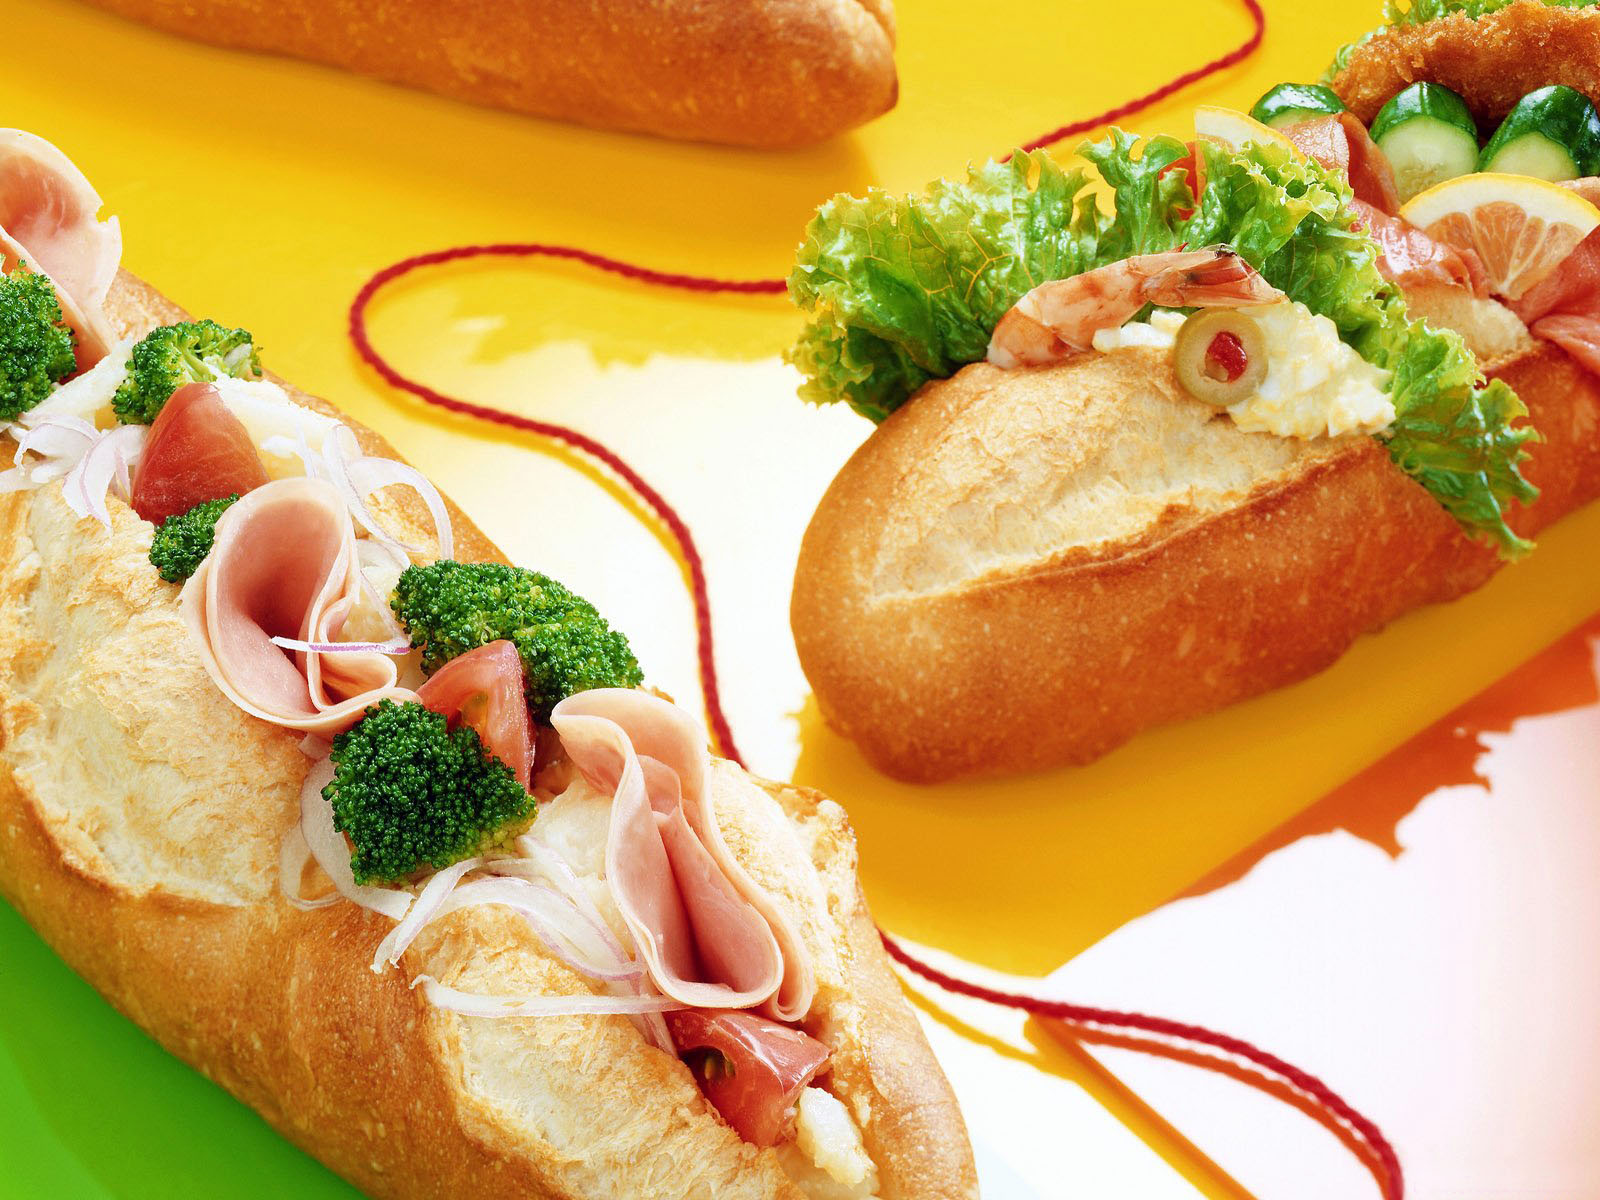 Junk Food HD Wallpapers 1600x1200